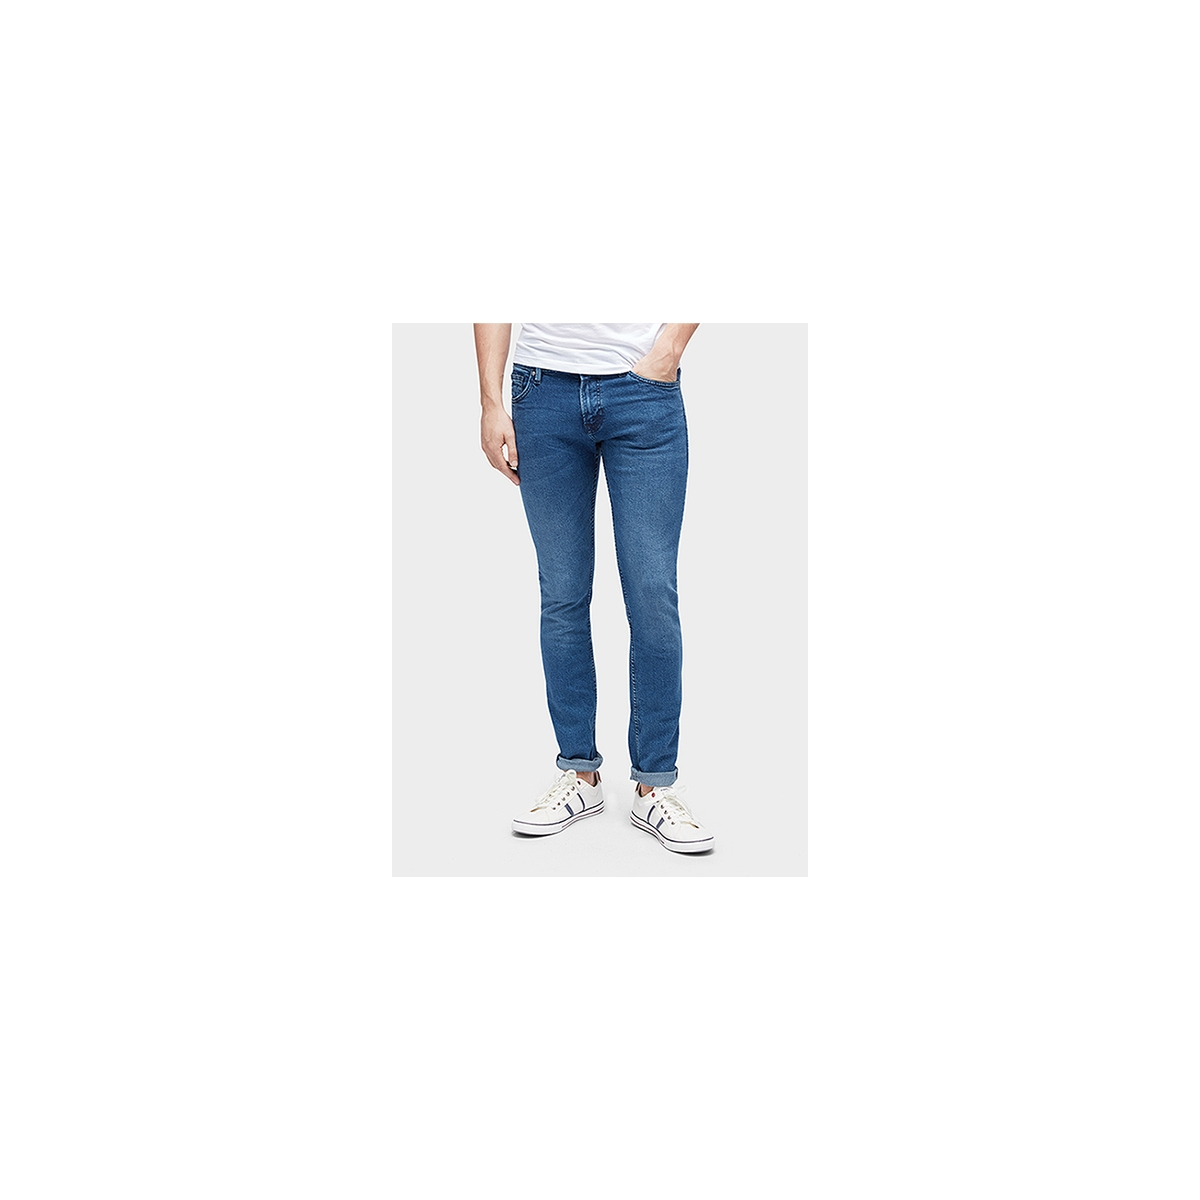 6255153.00.12 tom tailor jeans 1305